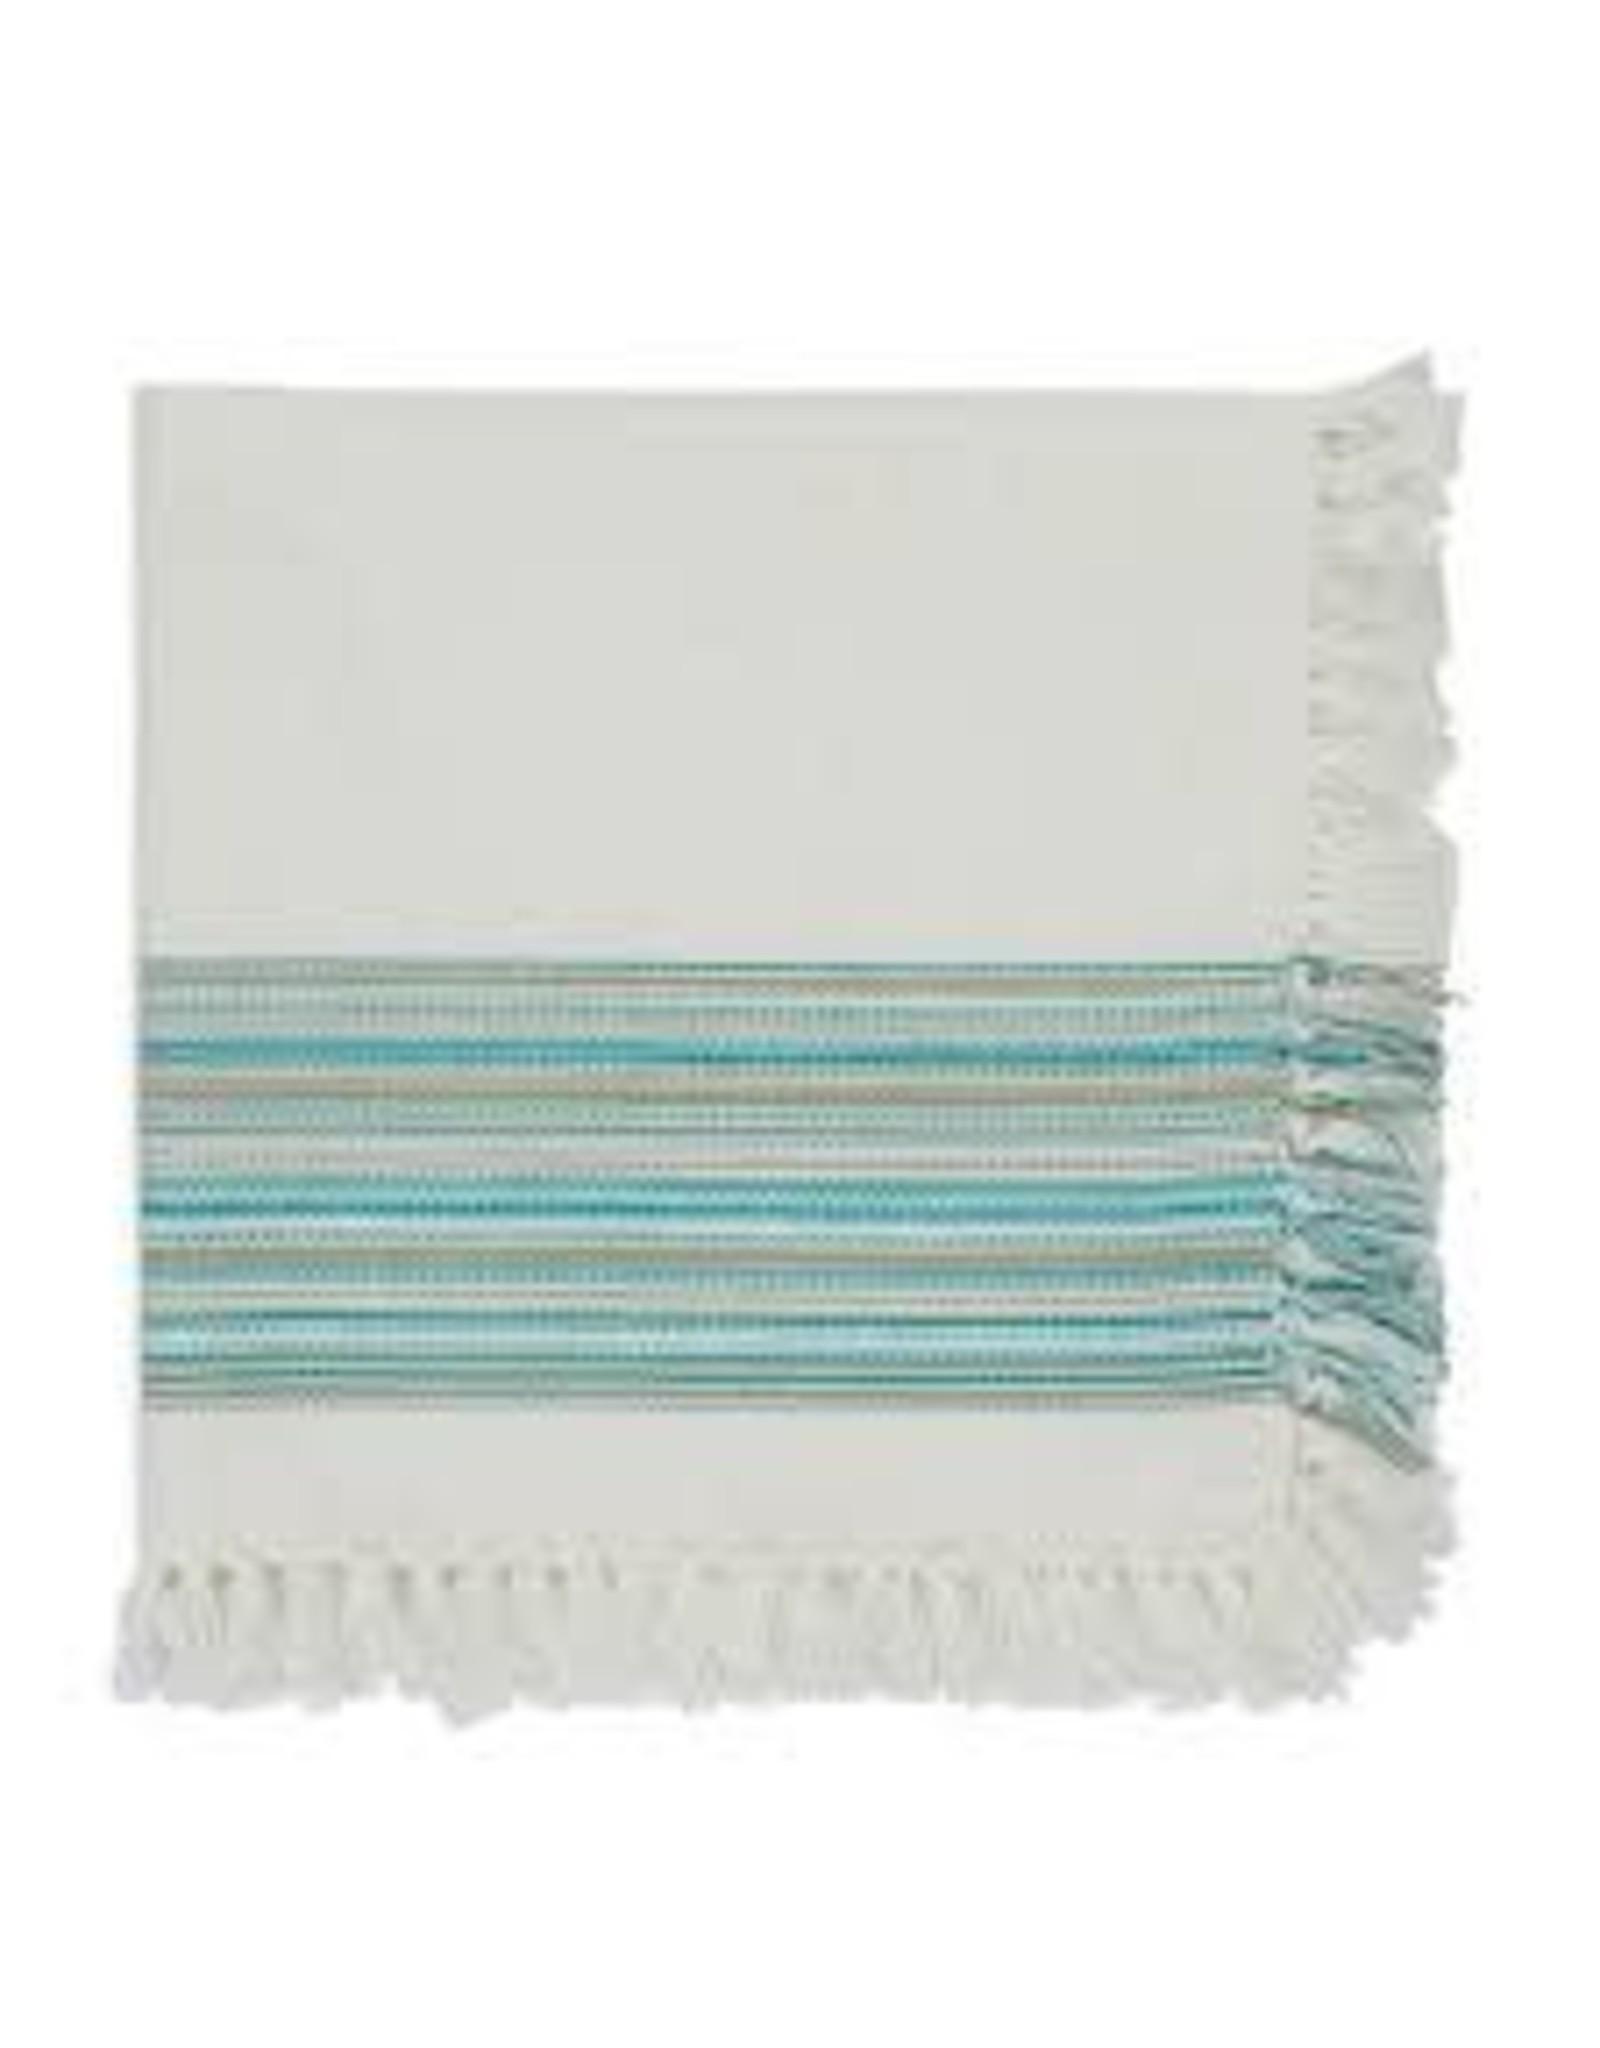 Design Imports DI-Teal Blue Fringe Napkin